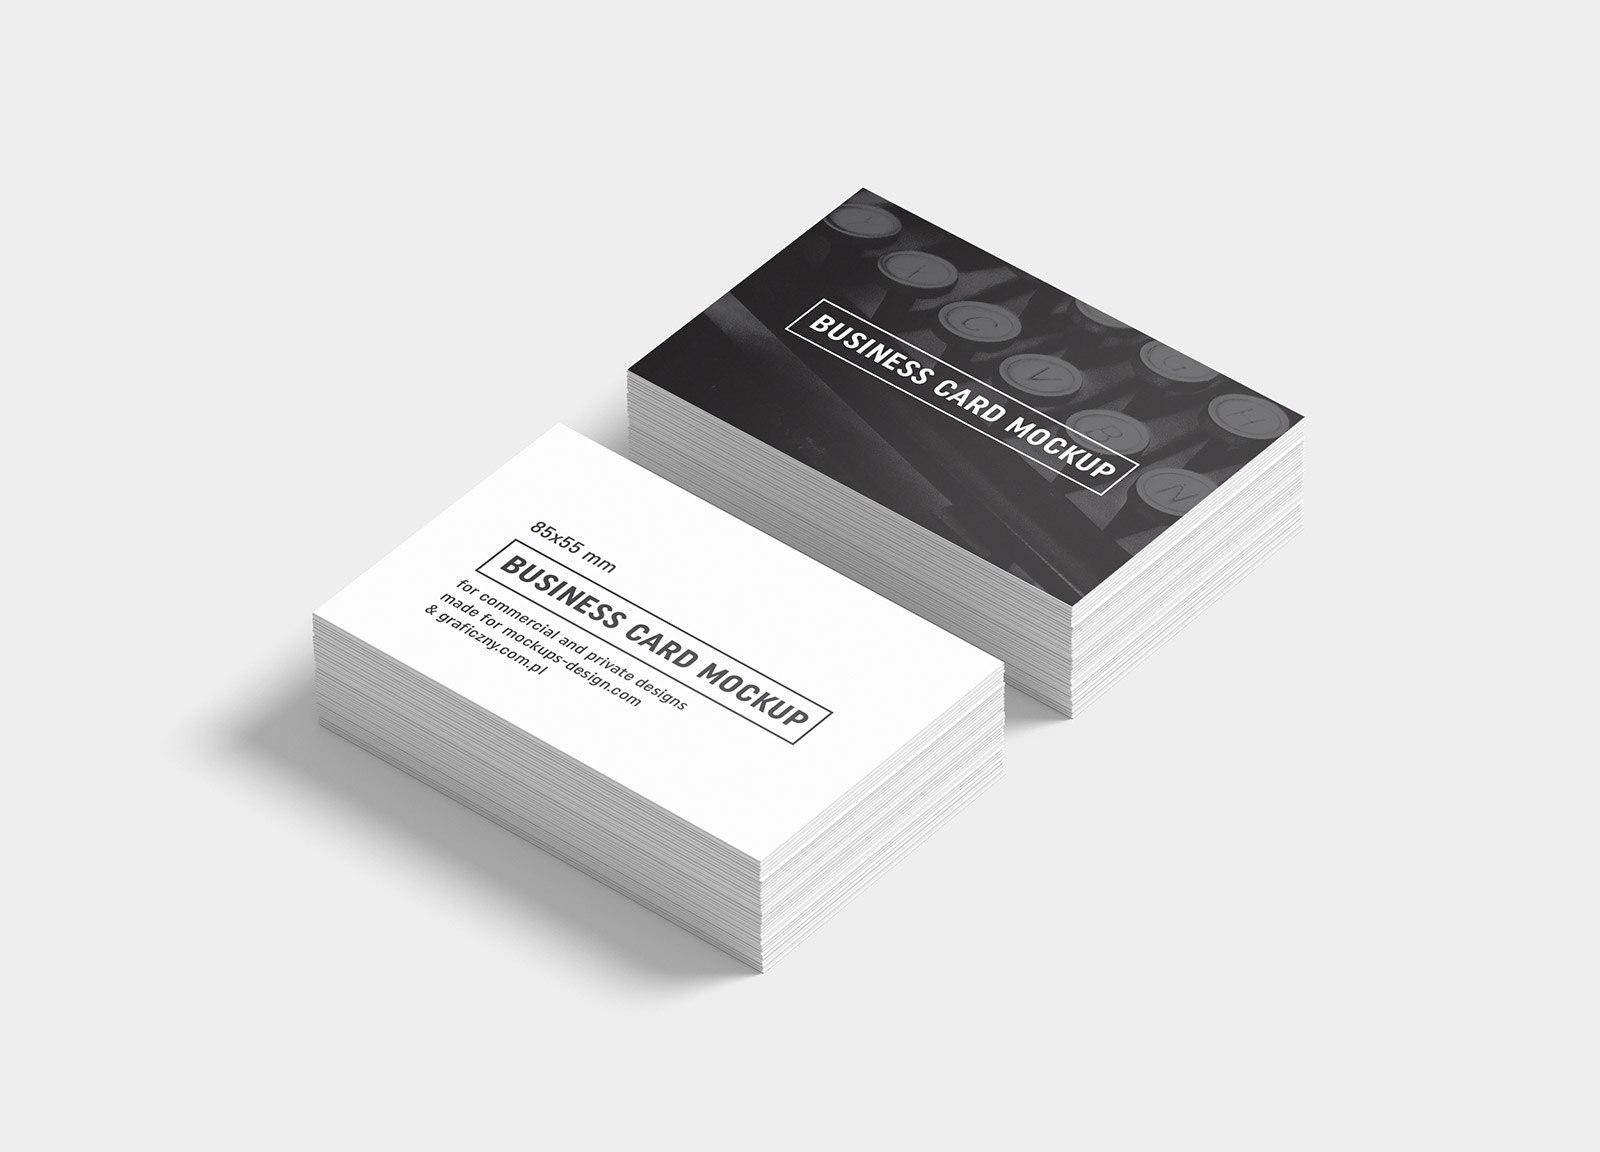 Free Black  White Business Card Mockup Psd Templates  Good Mockups Regarding Black And White Business Cards Templates Free